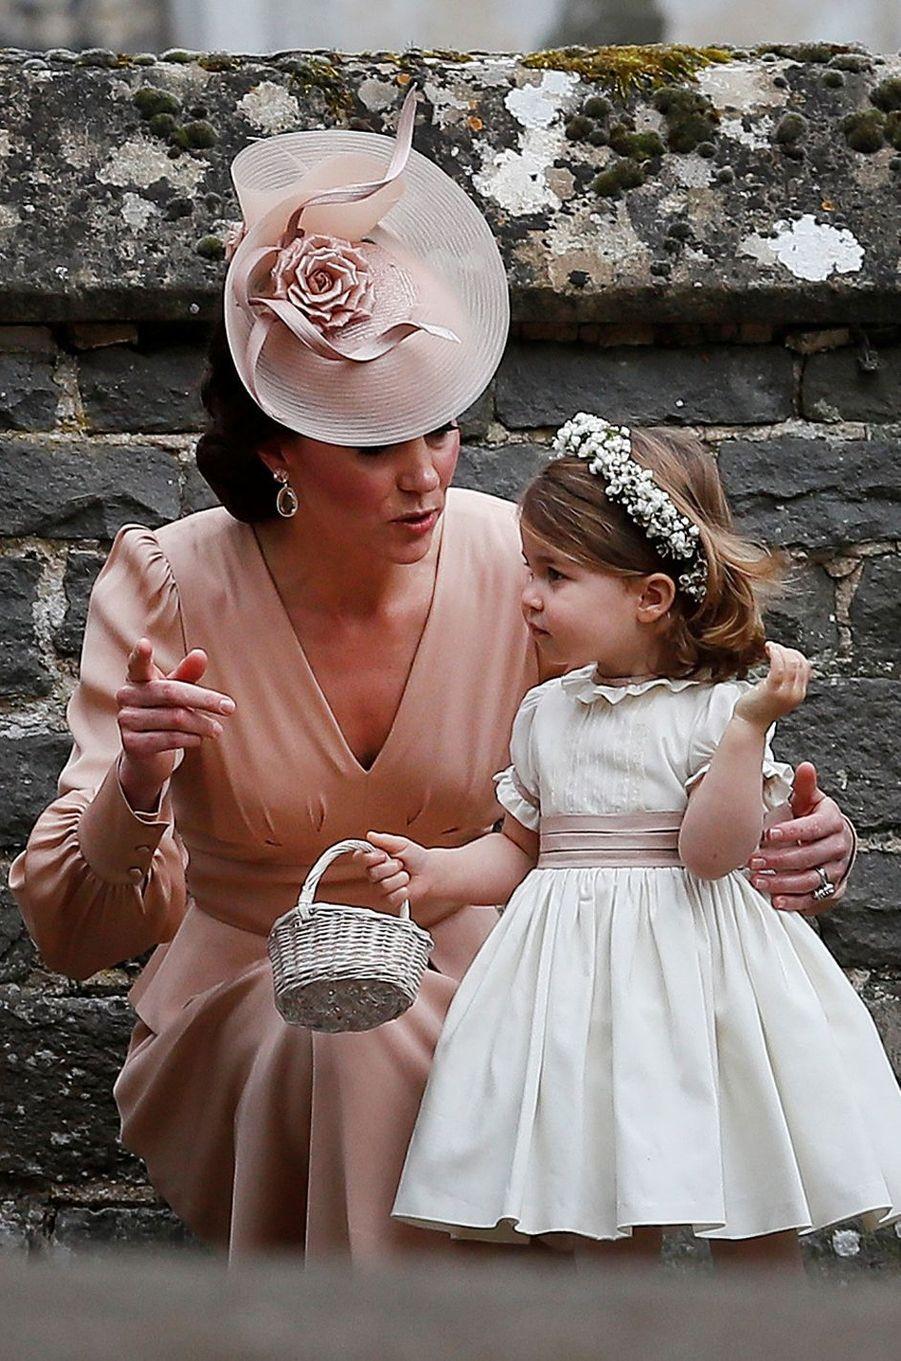 Le bibi de la duchesse Catherine de Cambridge au mariage de Pippa Middleton à Englefield, le 20 mai 2017